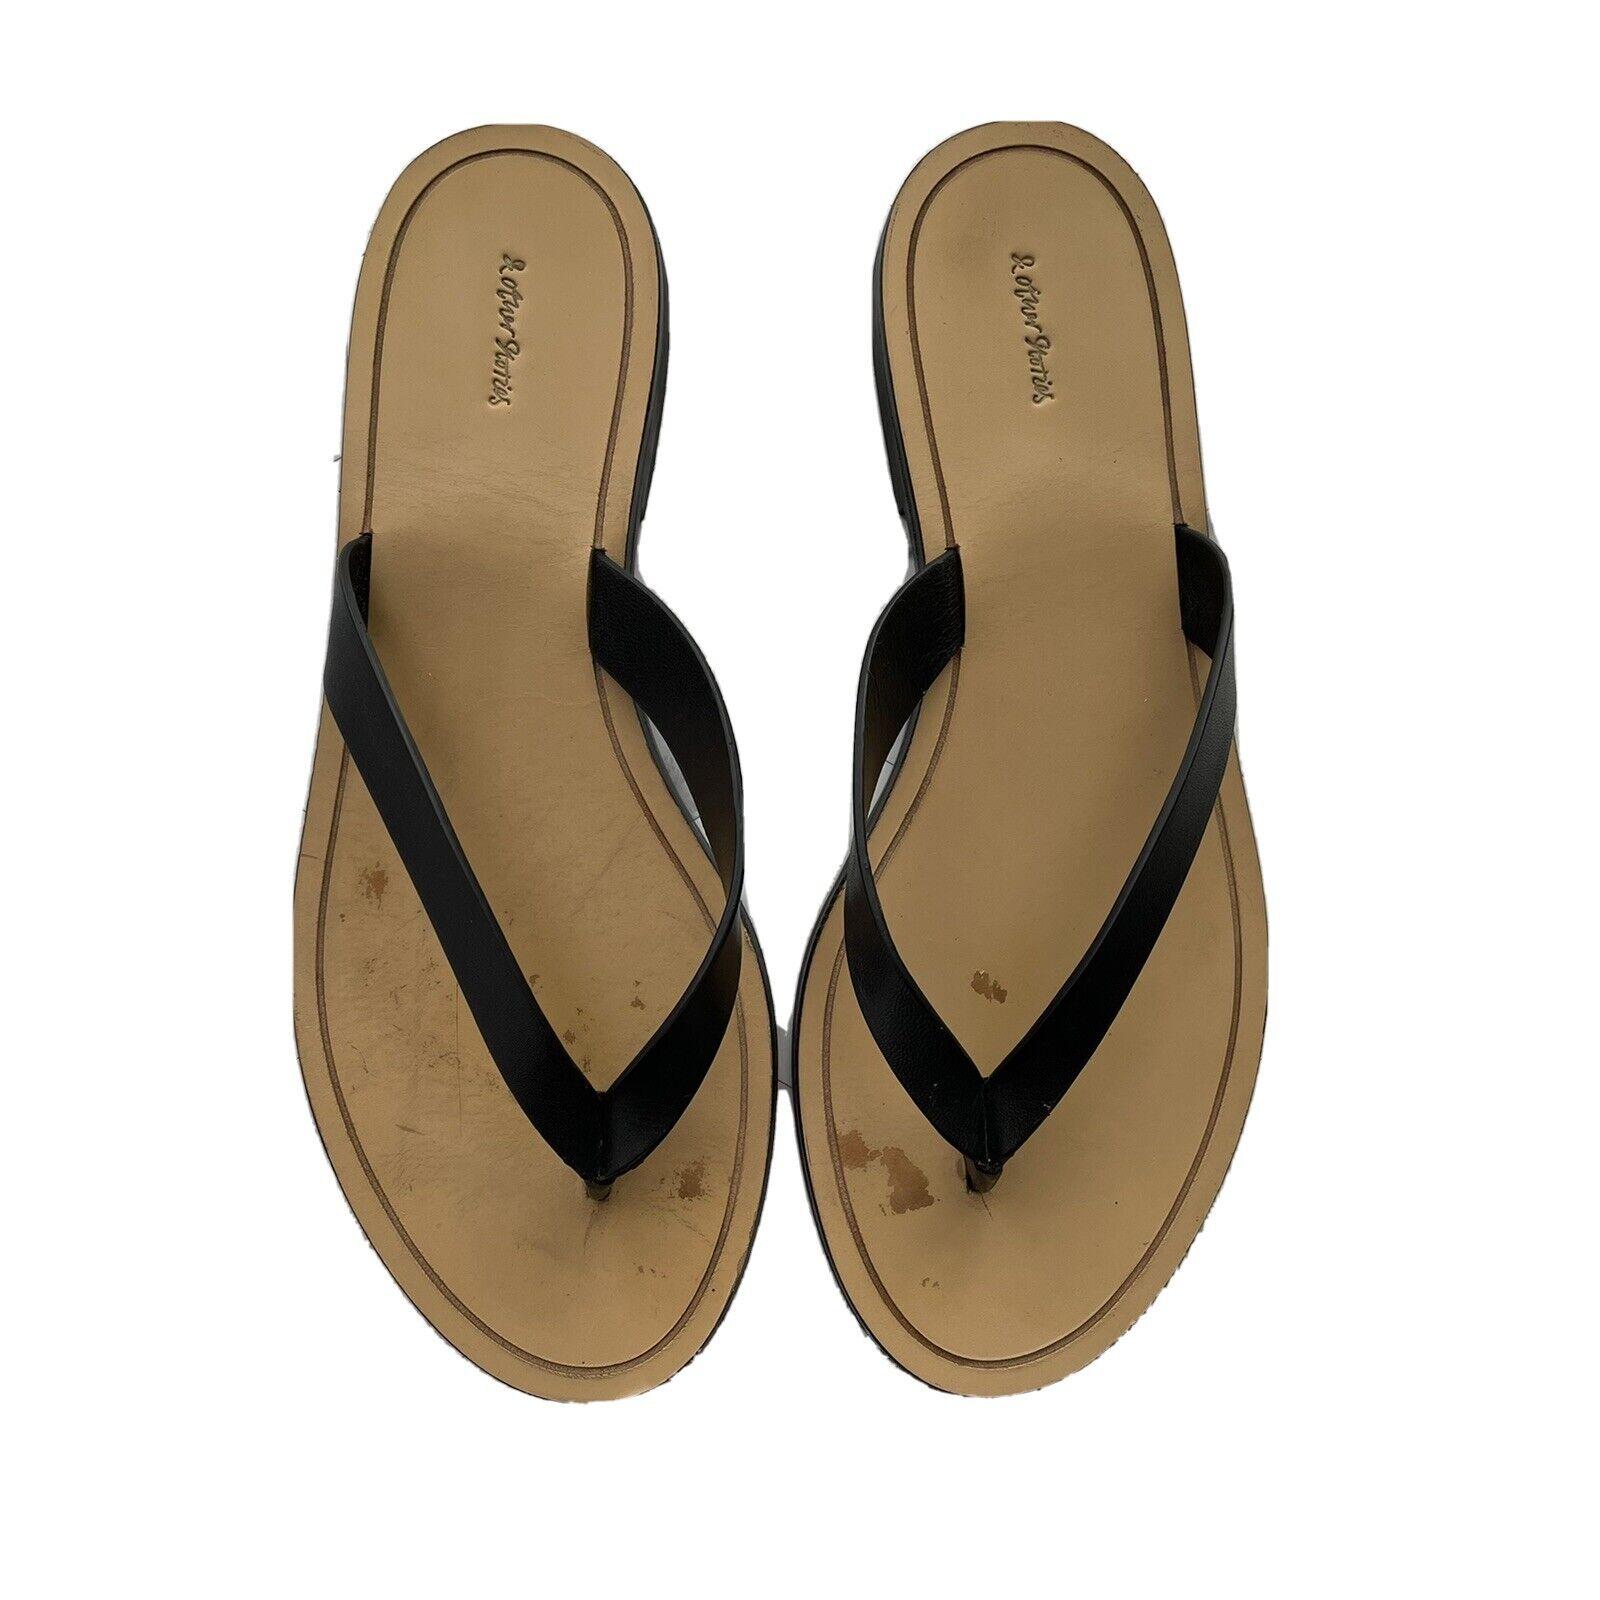 & OTHER STORIES Chaussures Femmes Cuir Noir Flip Flops Taille 7 US (37 euros)